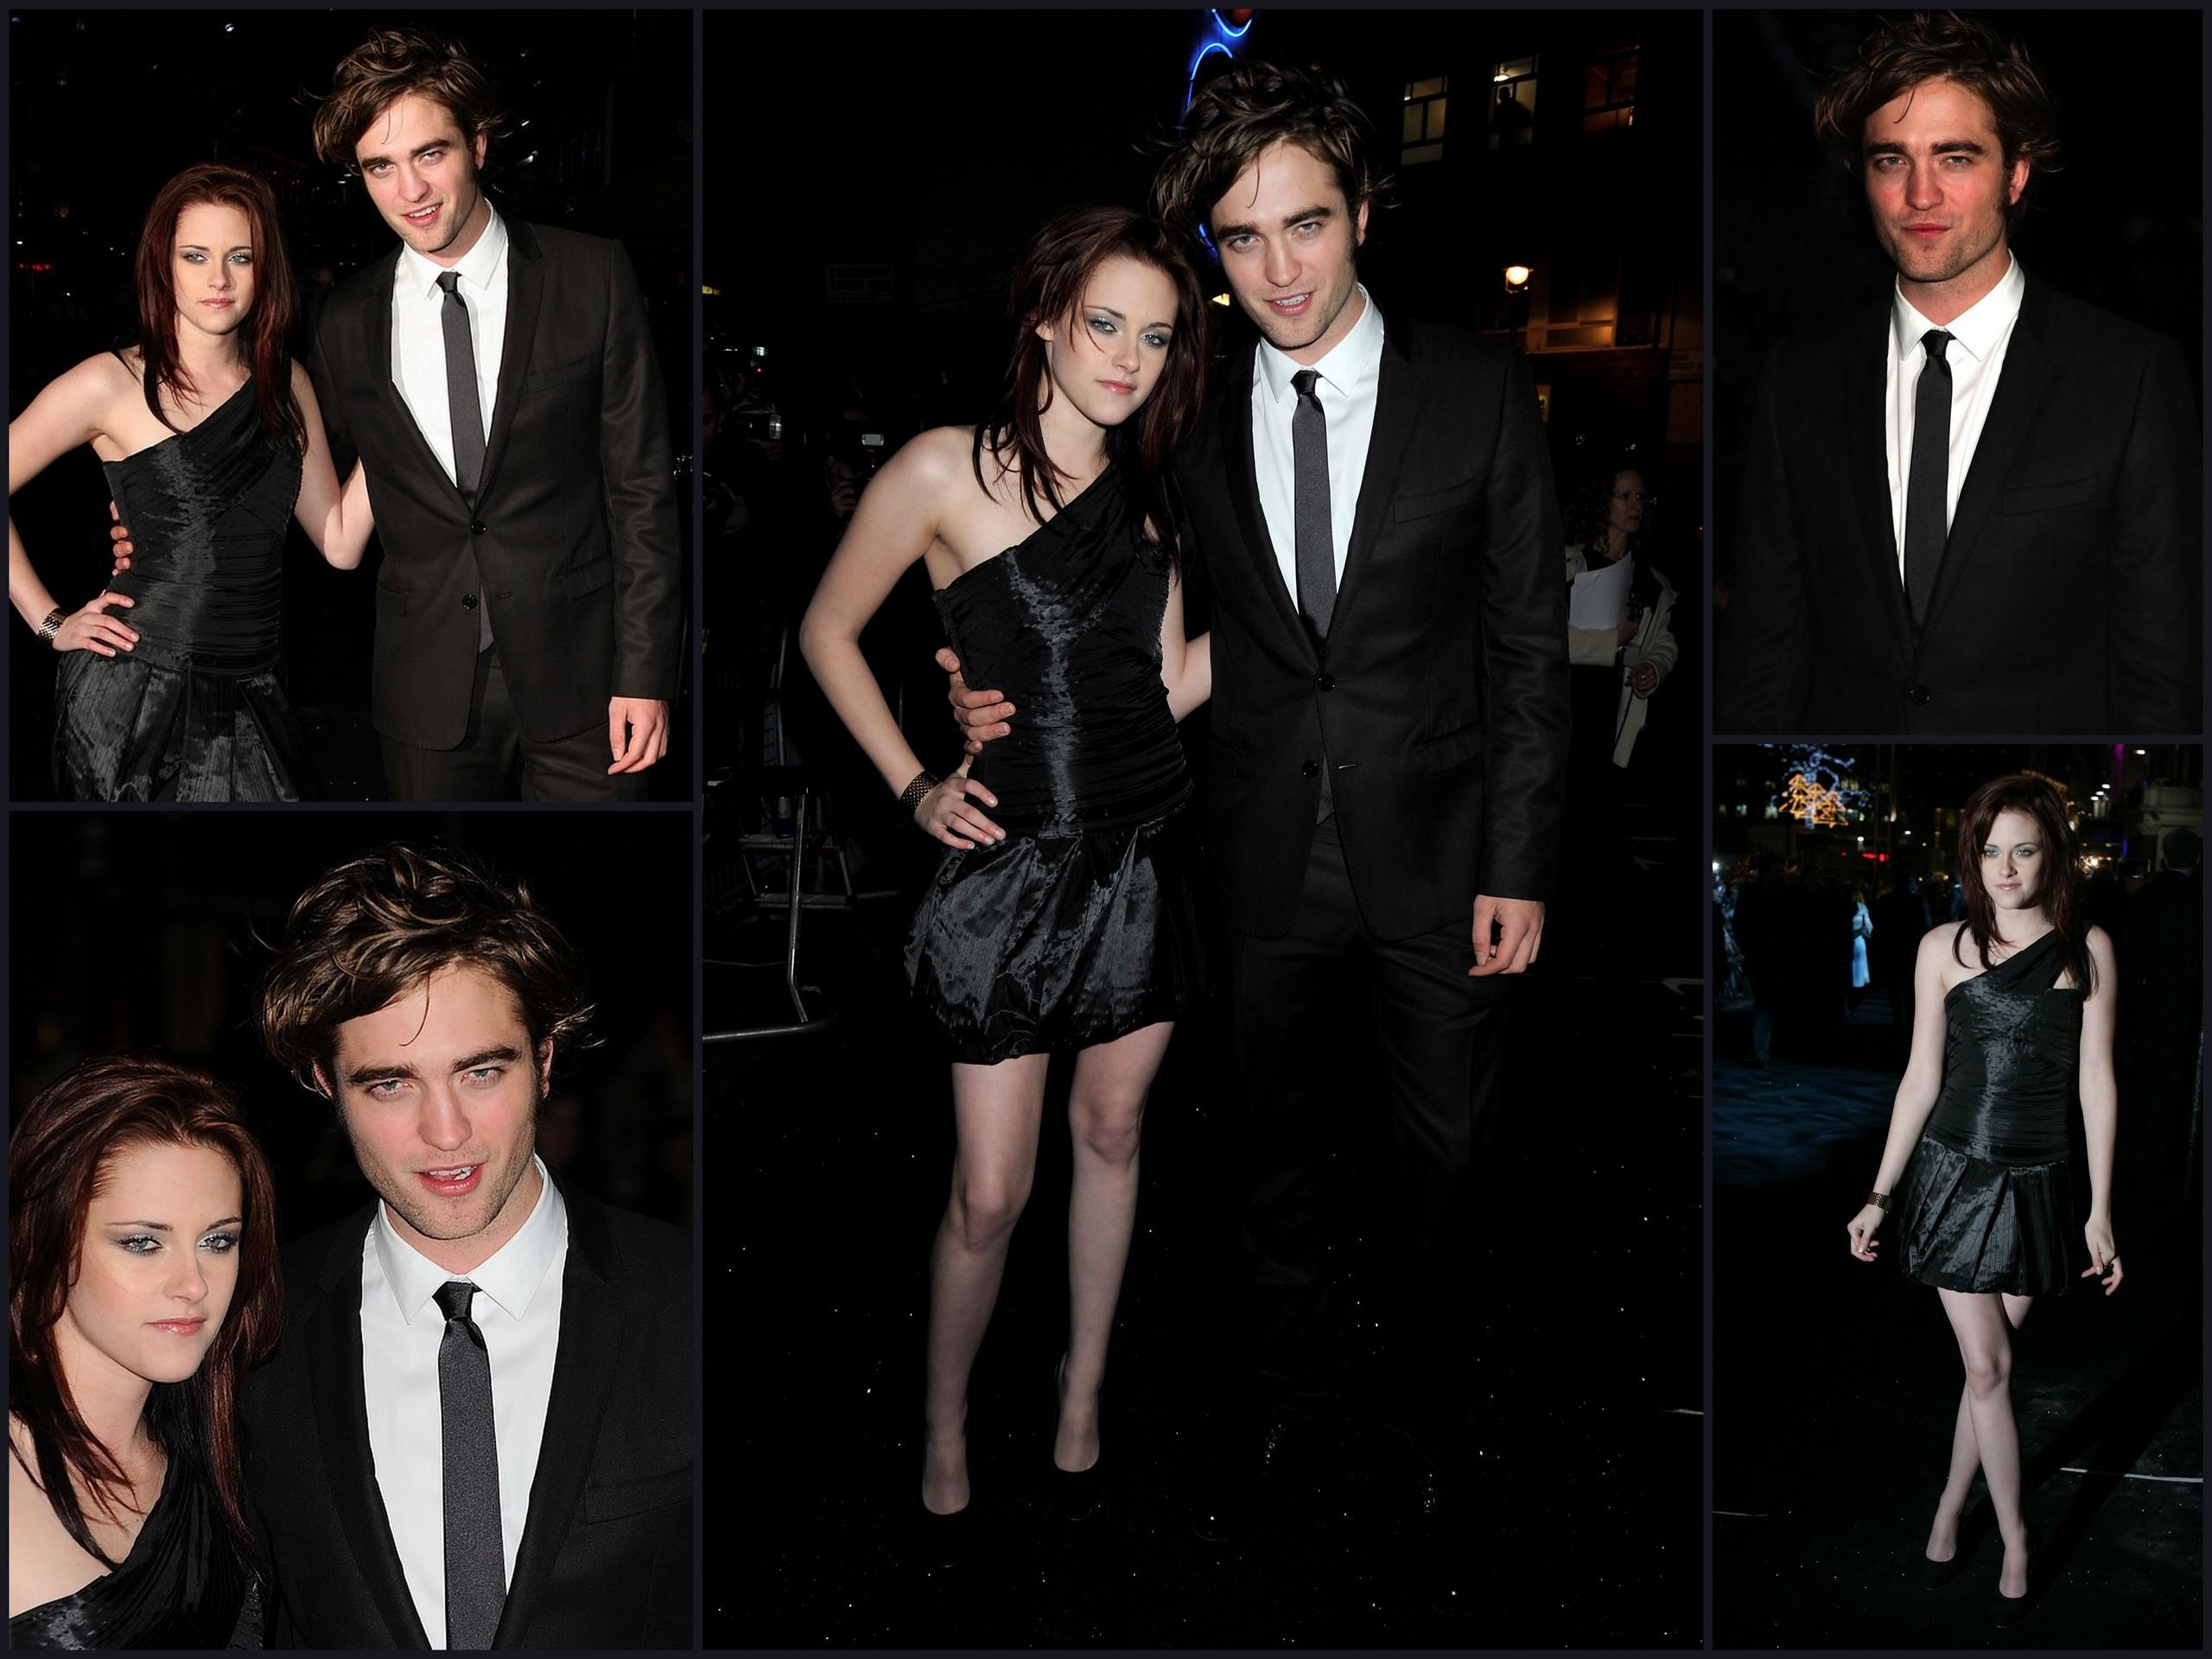 Twilight in Londra